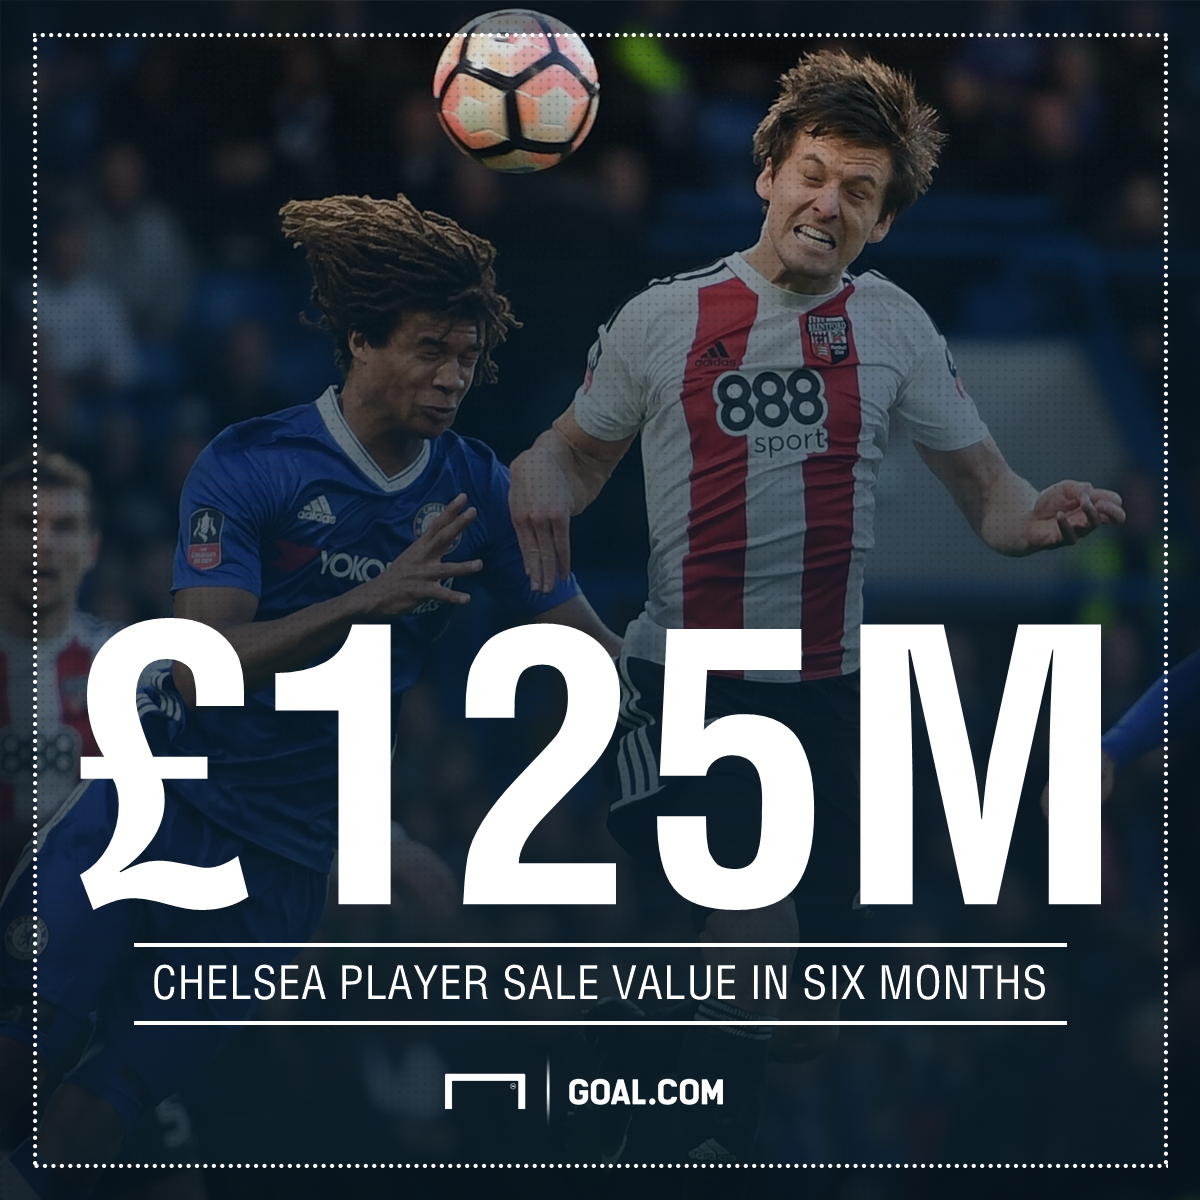 Chelsea fee